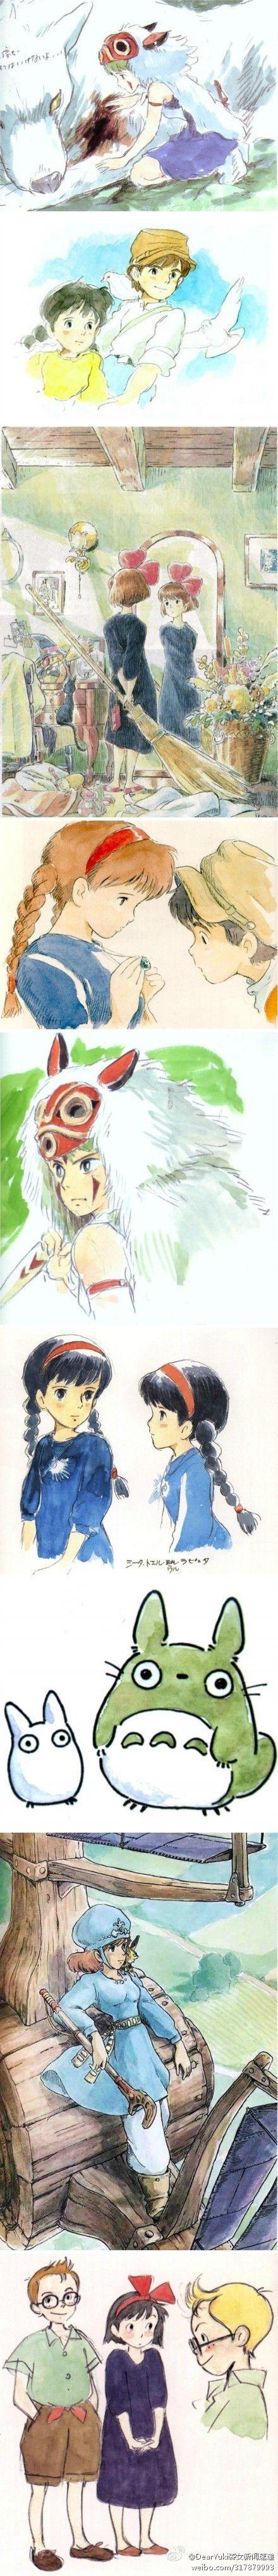 Beautiful Studio Ghibli Art